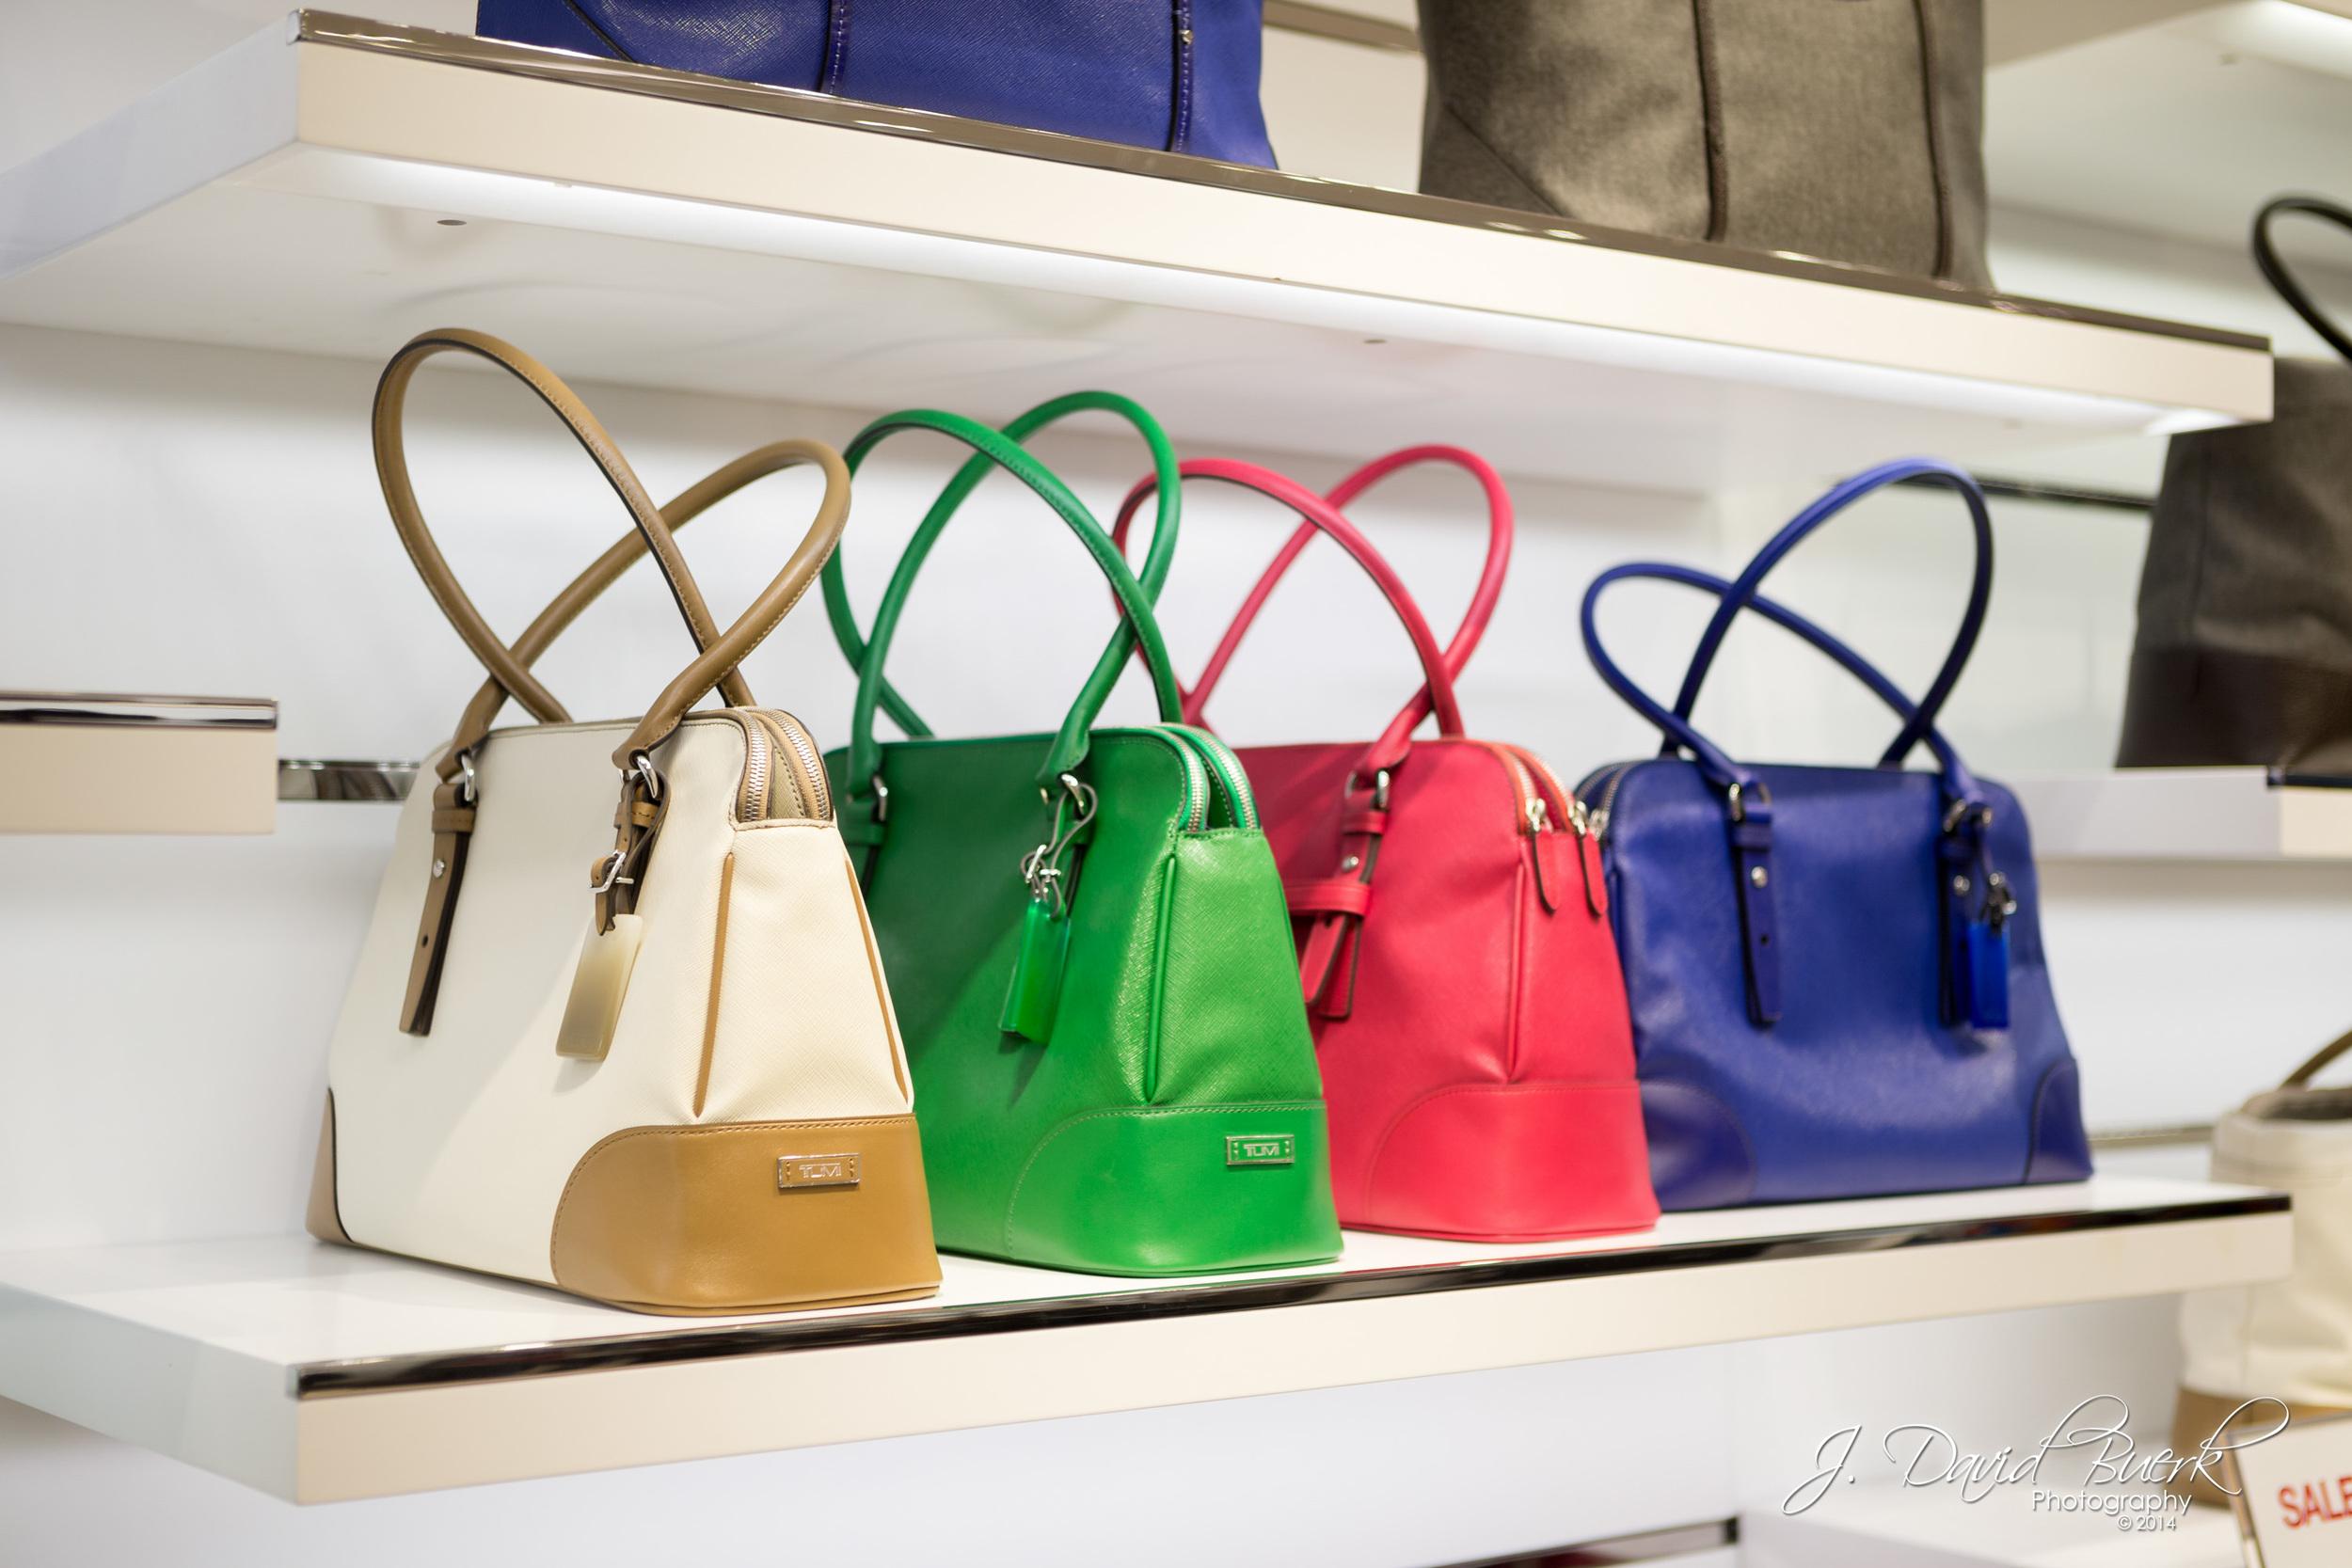 Women's handbagsinside Washington Dulles International Airport's Tumi.